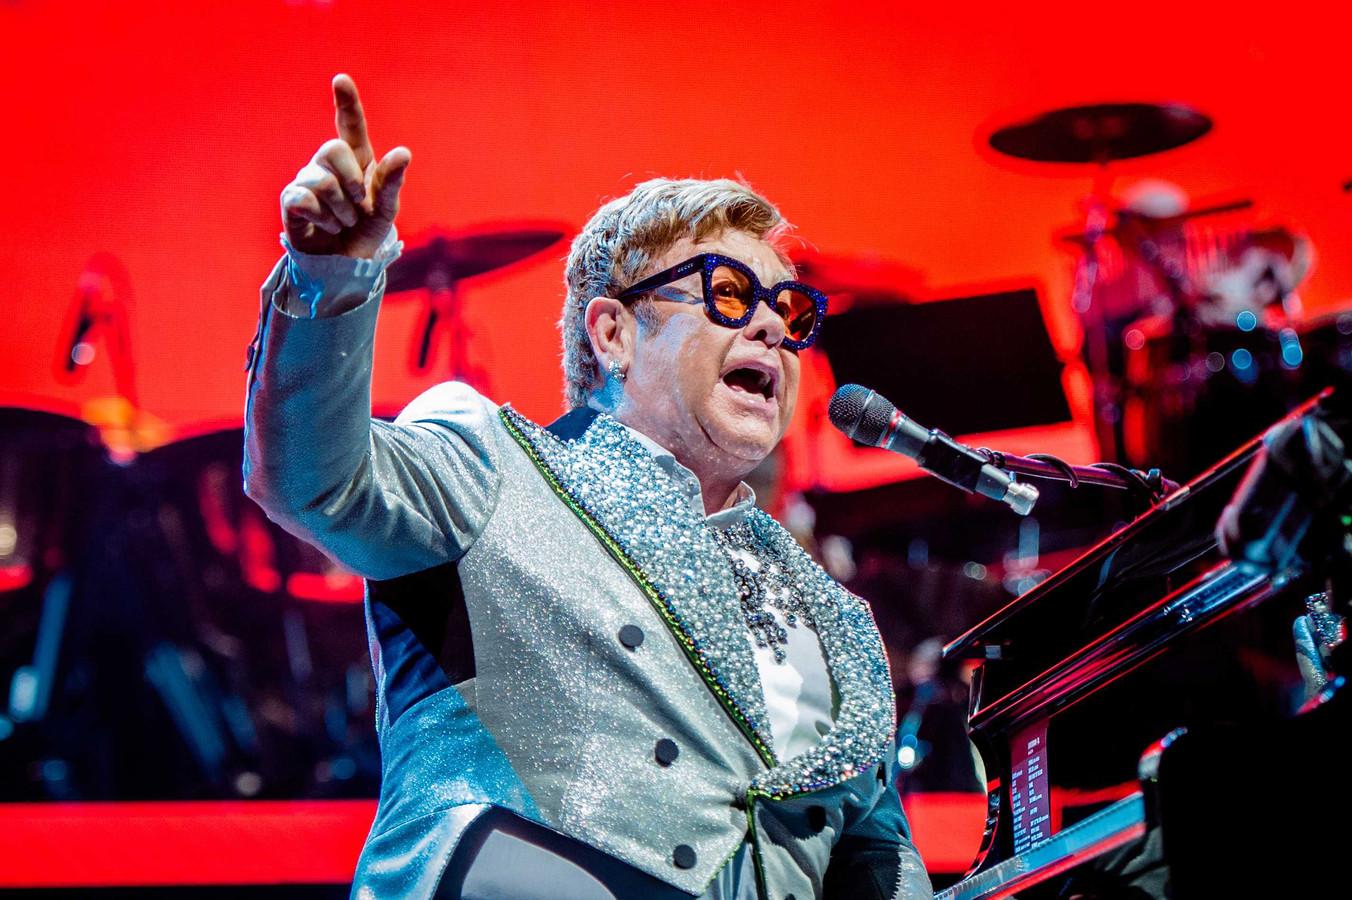 Elton John in Ziggo Dome